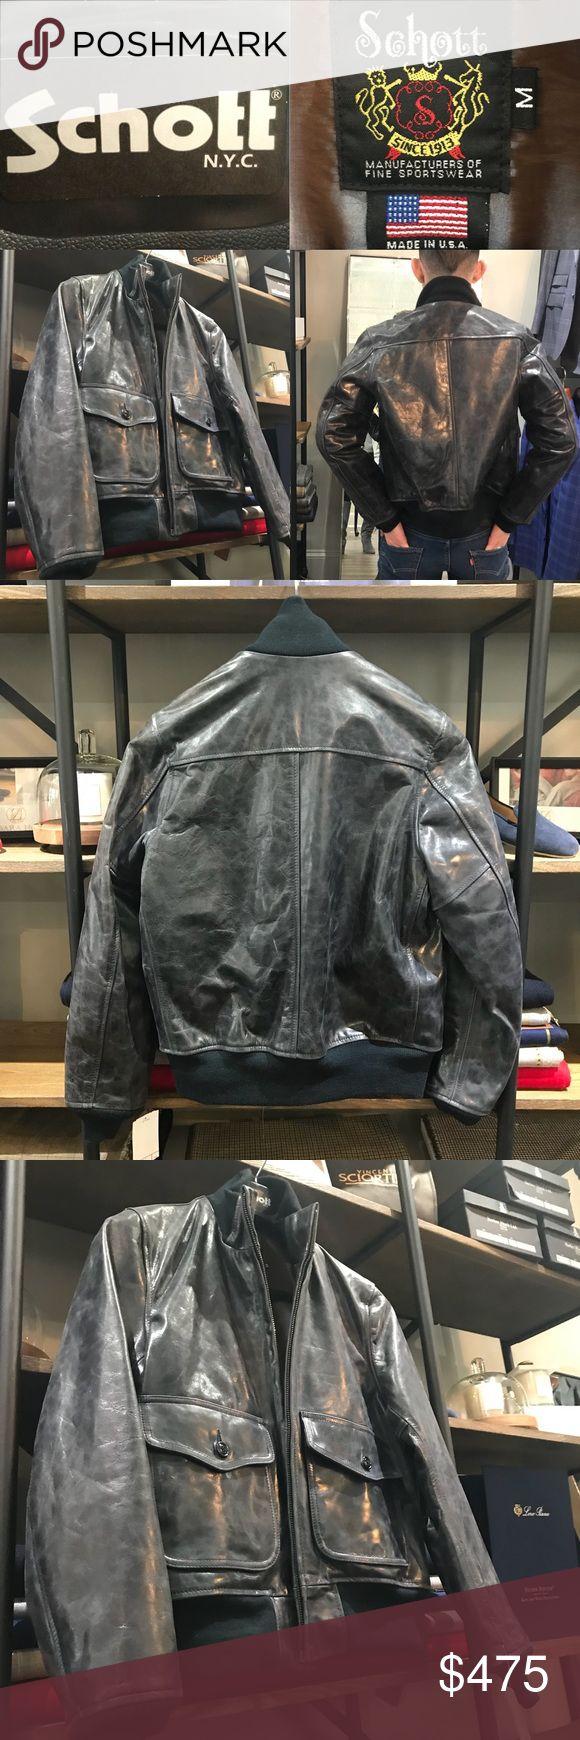 Schott Leather Jacket NWT - Schott Leather Jacket, size medium, color is slate (blue/gray), lined, pockets, silver hardware Schott NYC Jackets & Coats Bomber & Varsity